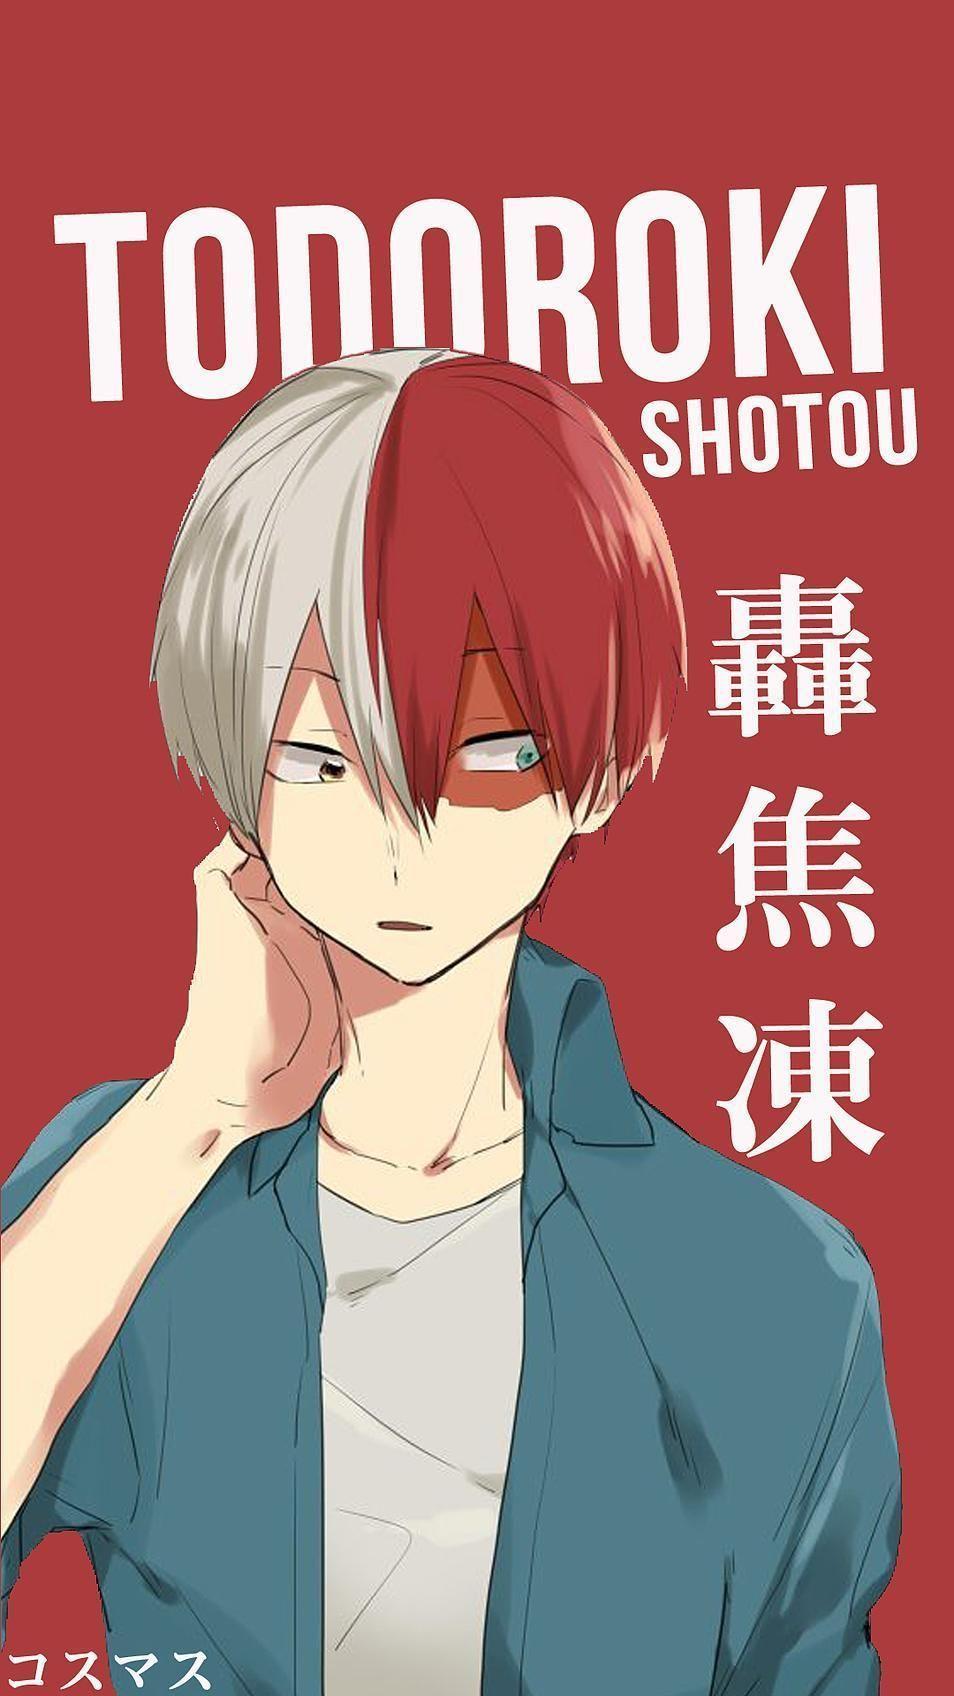 Boku no hero academia todoroki. My Hero Academia Todoroki Wallpapers - Top Free My Hero ...